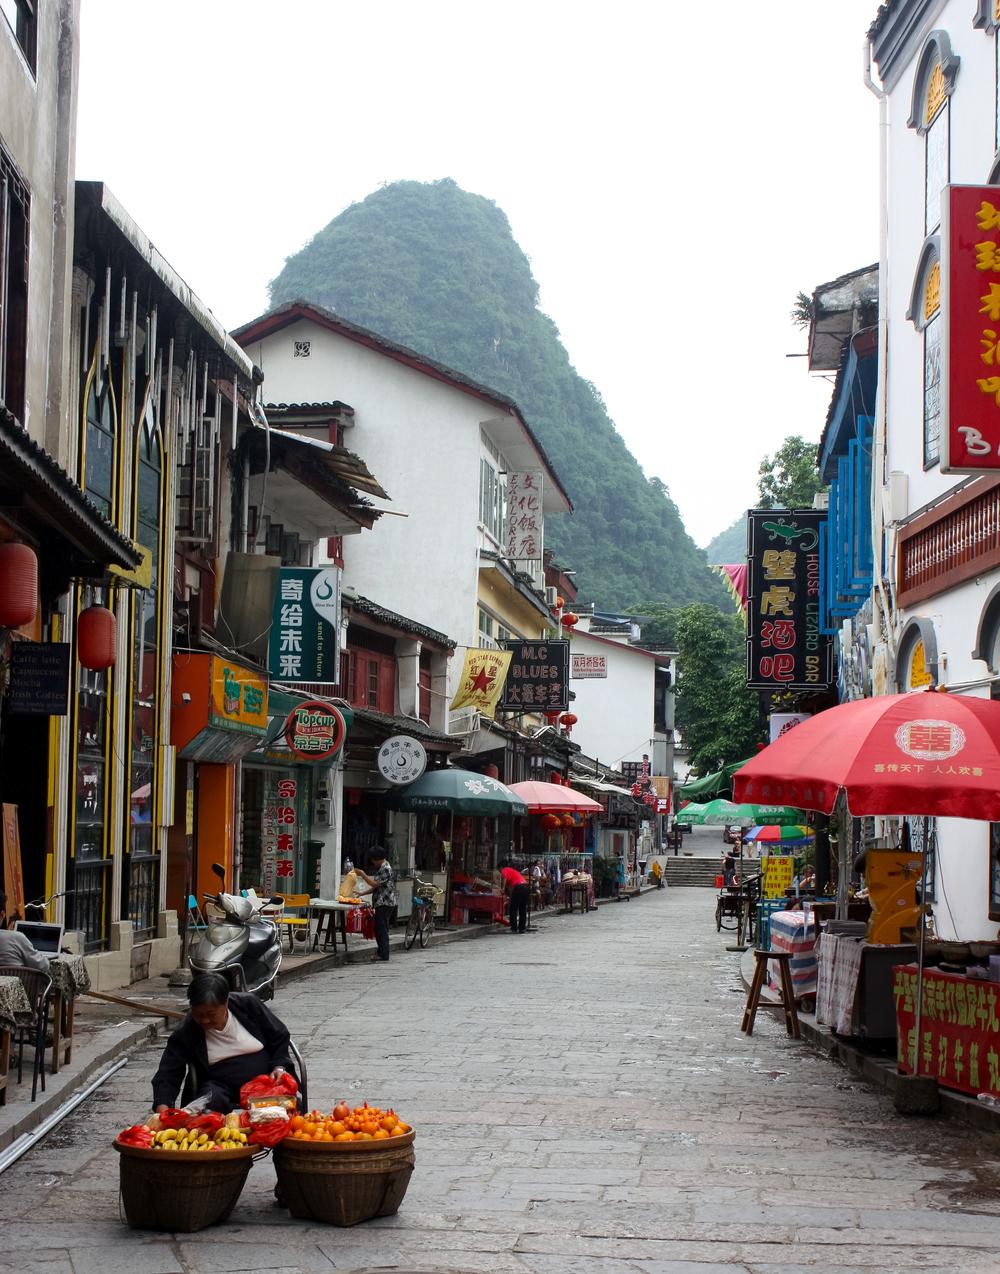 West Street, Yangshuo, China